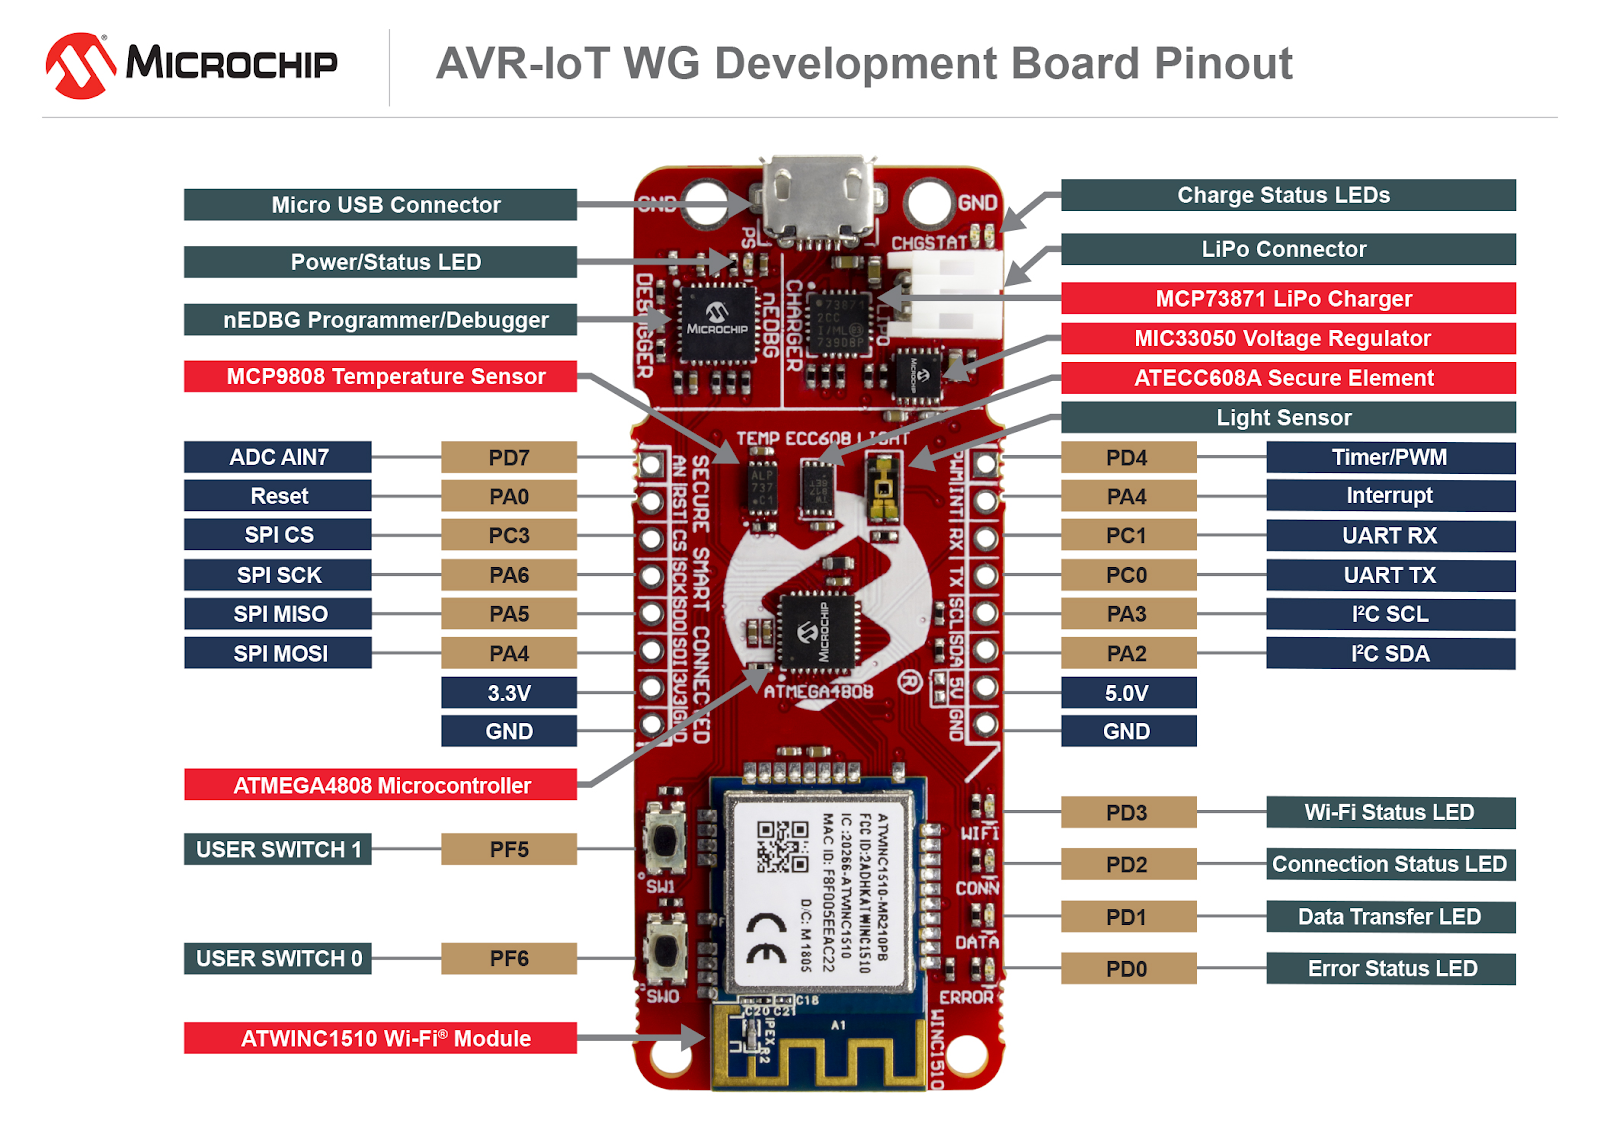 Microchip AVR-IoT WG Dev Board - Review | element14 | RoadTests